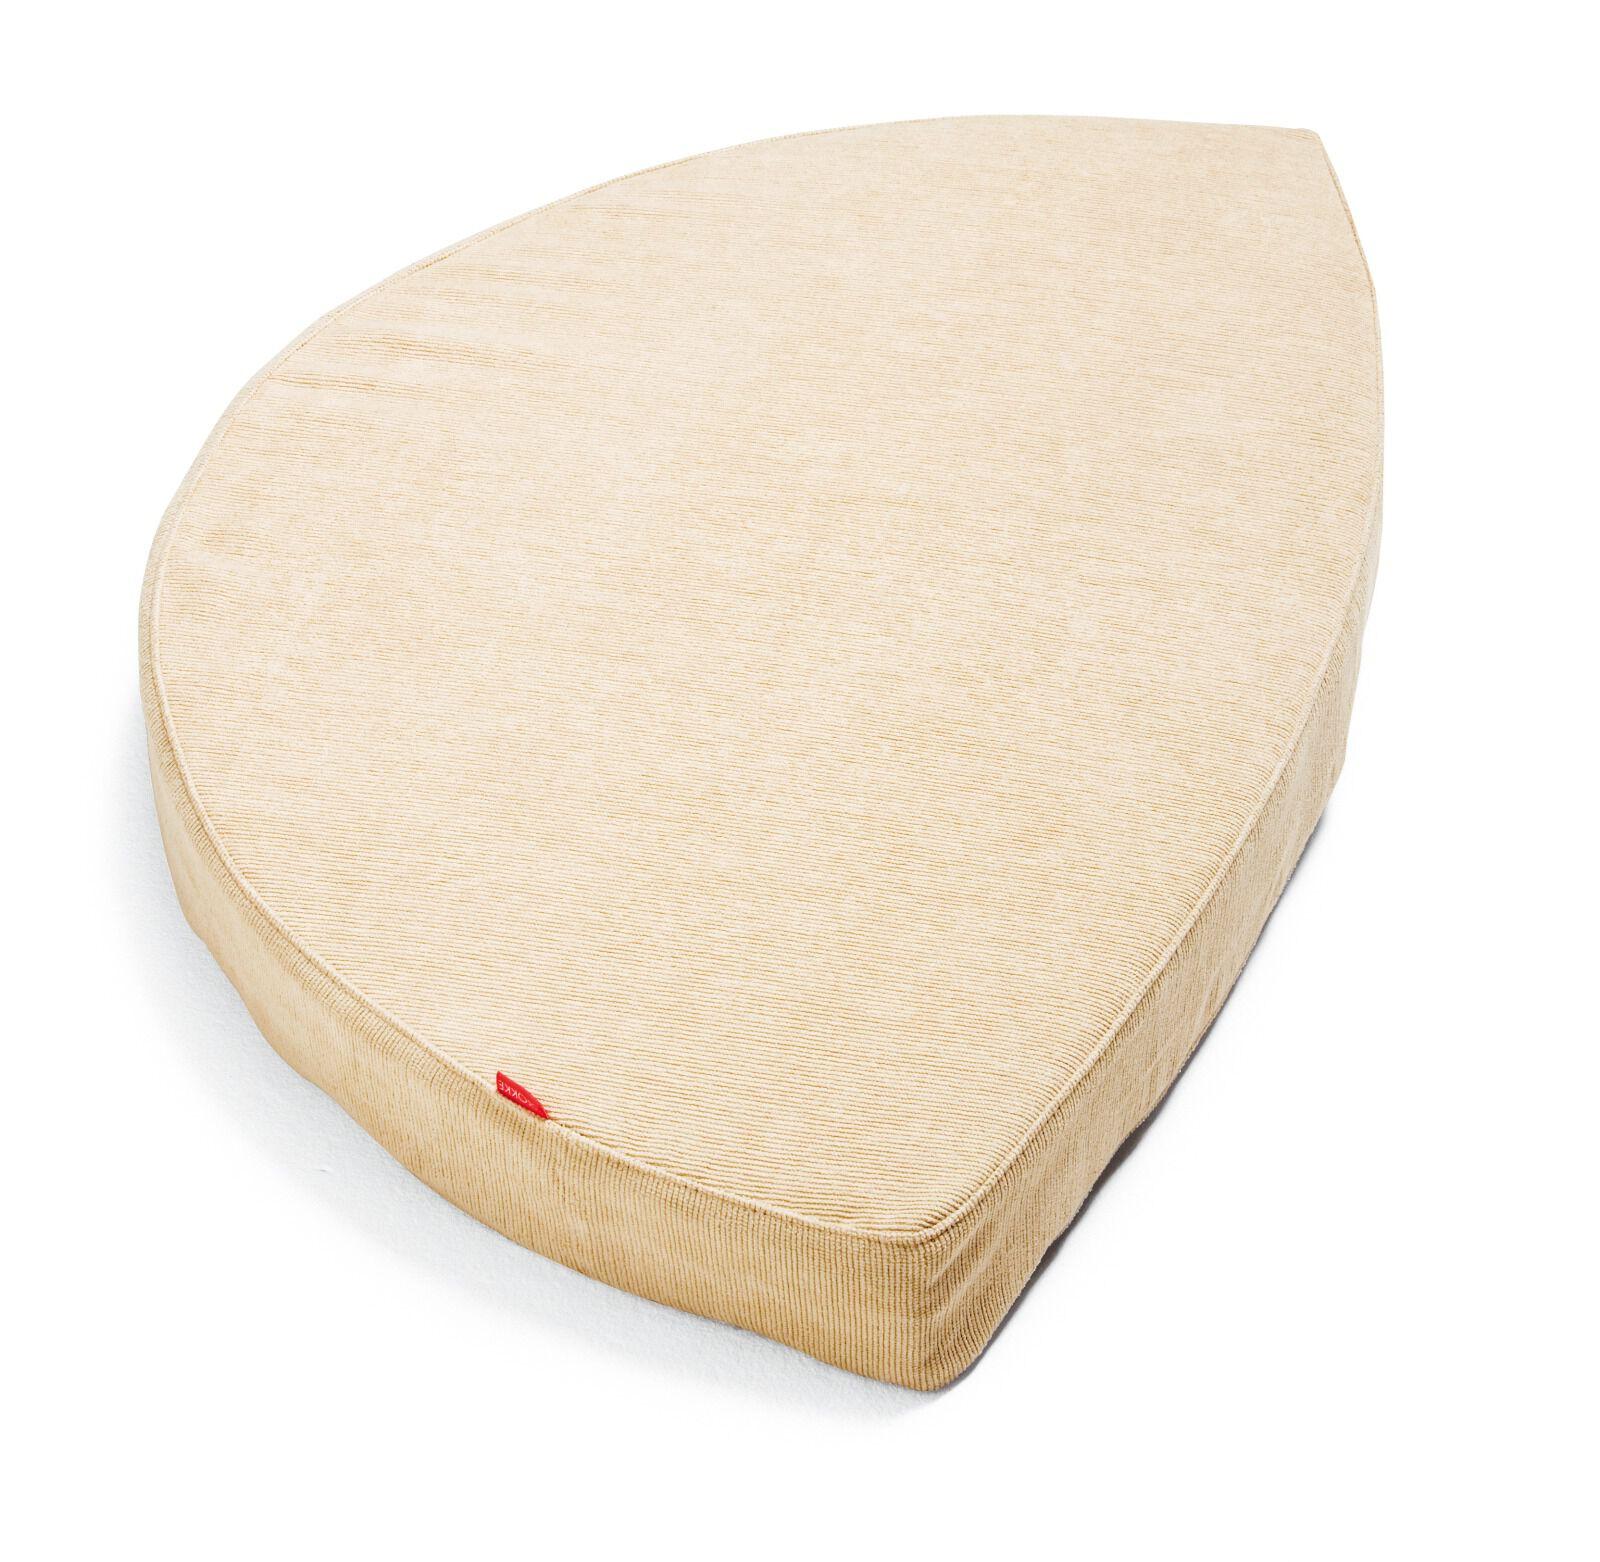 Stokke® Sleepi™ Chair Cushion With Cover, Beige.